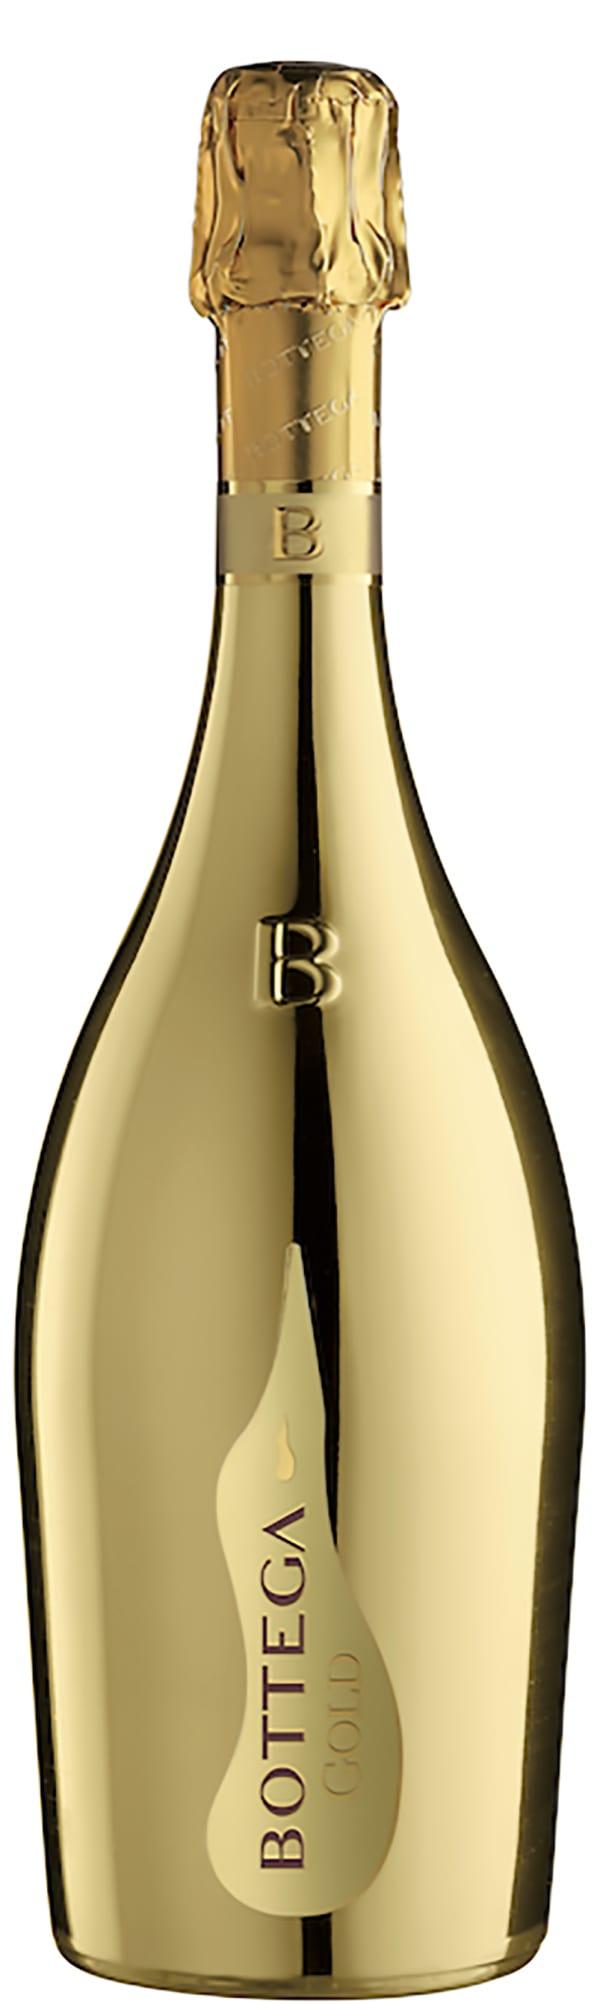 Bottega Gold Brut 2018